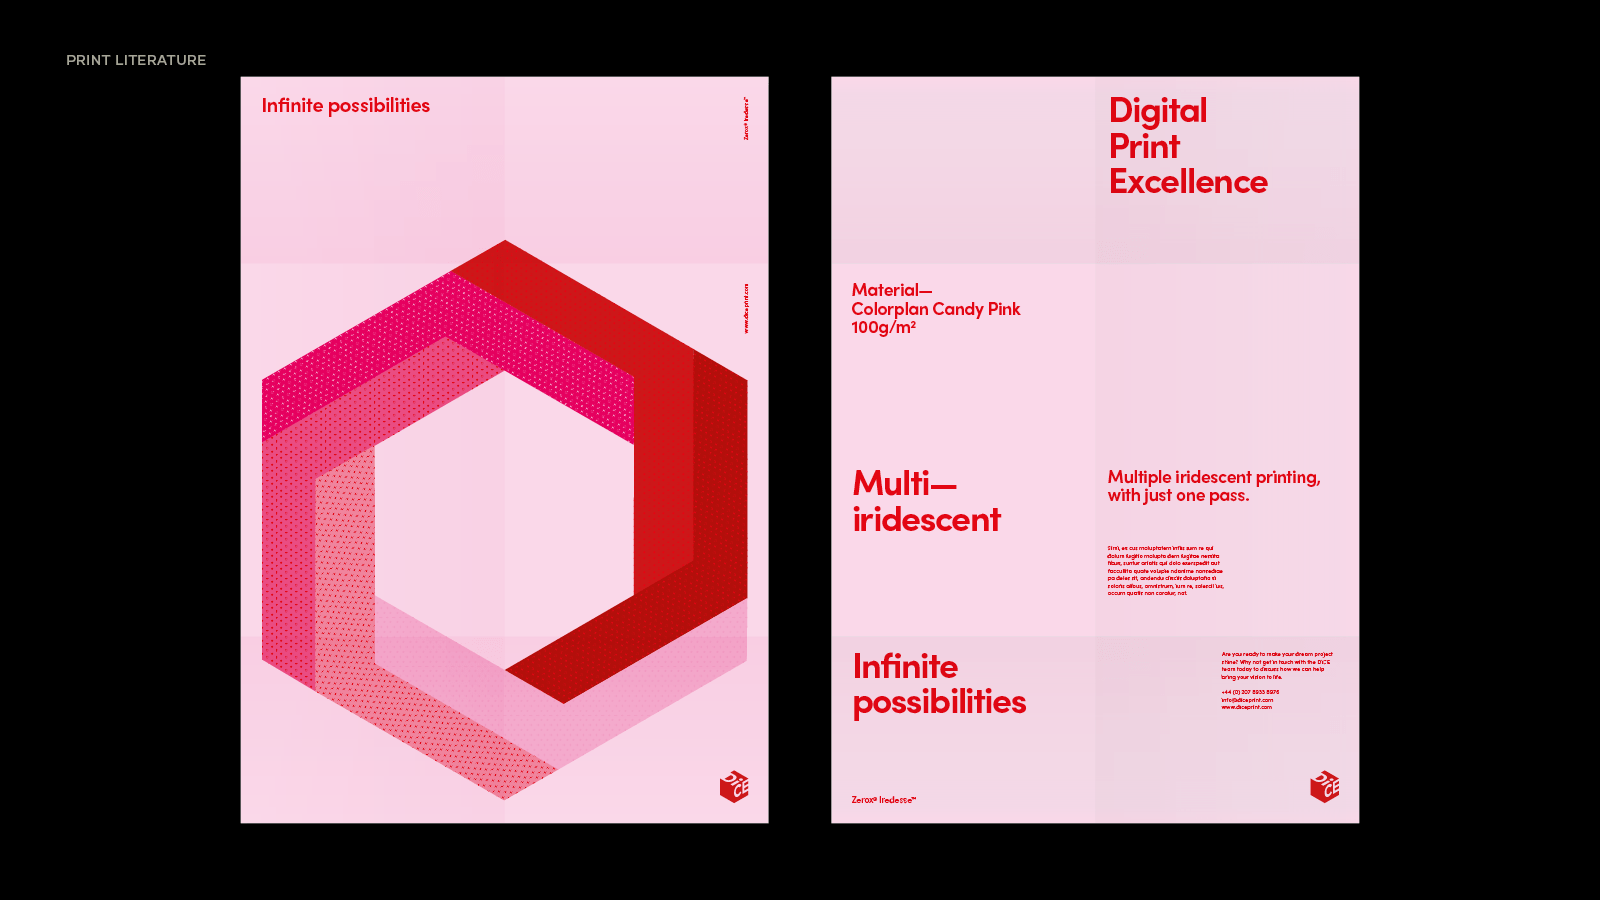 digital-printer-logo-identity-design-branding-milton-keynes-6